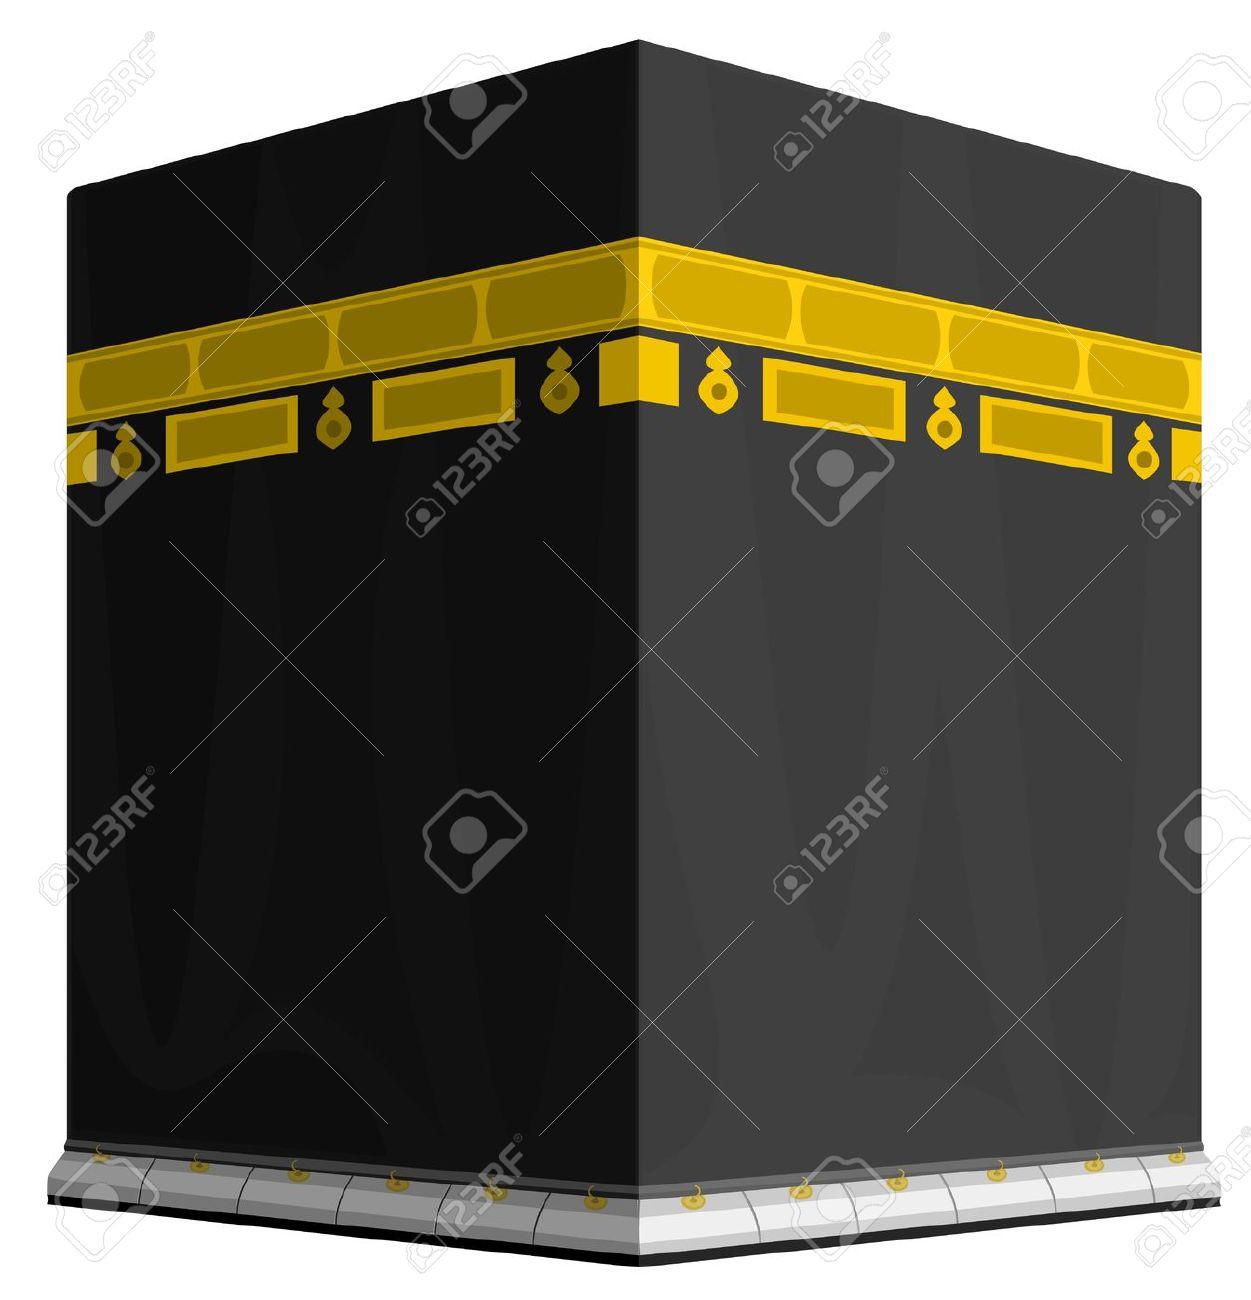 534 Kaaba Stock Illustrations, Cliparts And Royalty Free Kaaba Vectors.